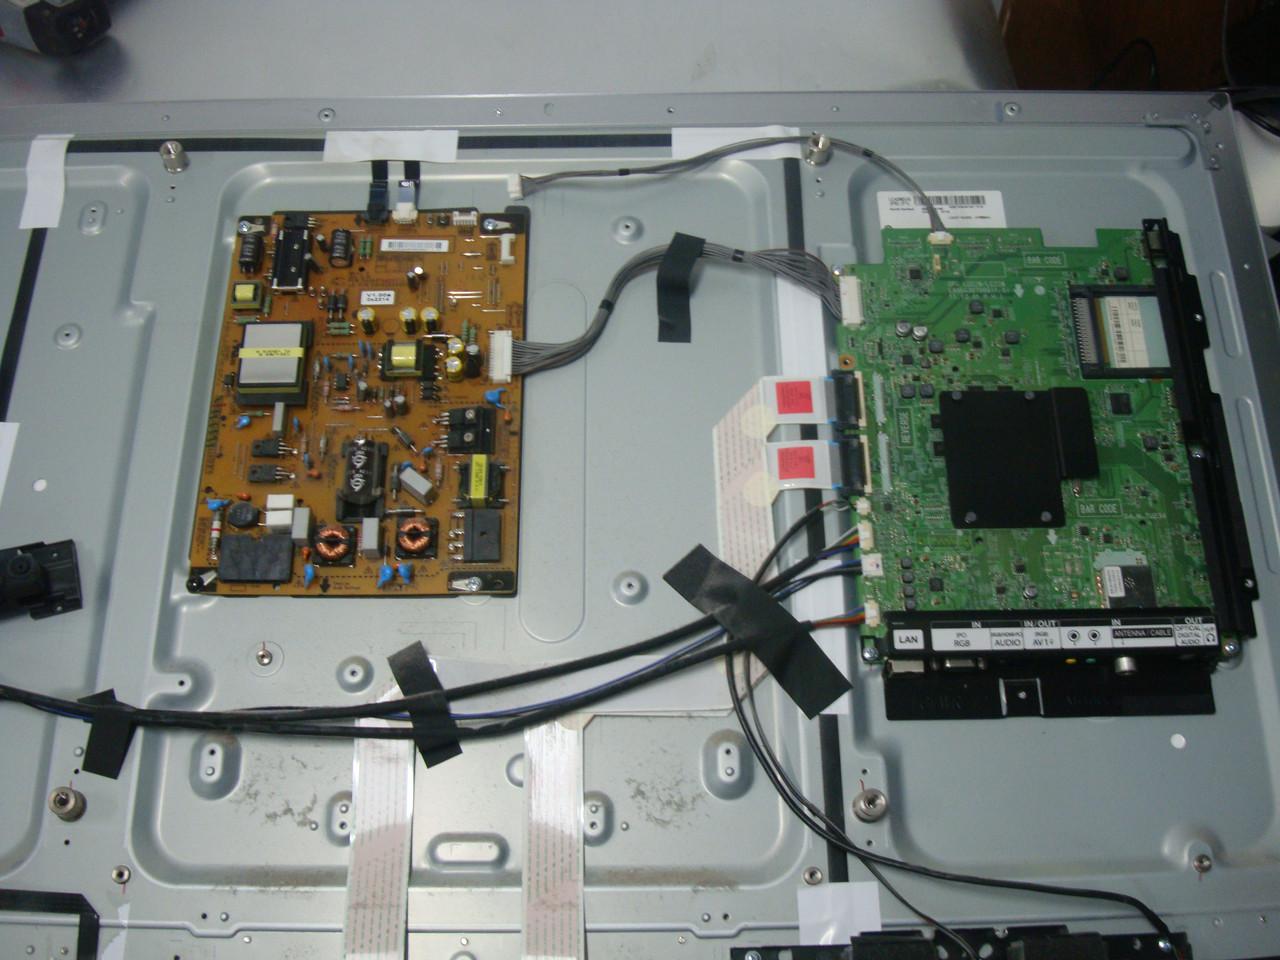 Запчасти к телевизору LG 42LM660T (EAX64744201, EAD62087805 EAD62087806, EBR74560901, TWFM-B003D)